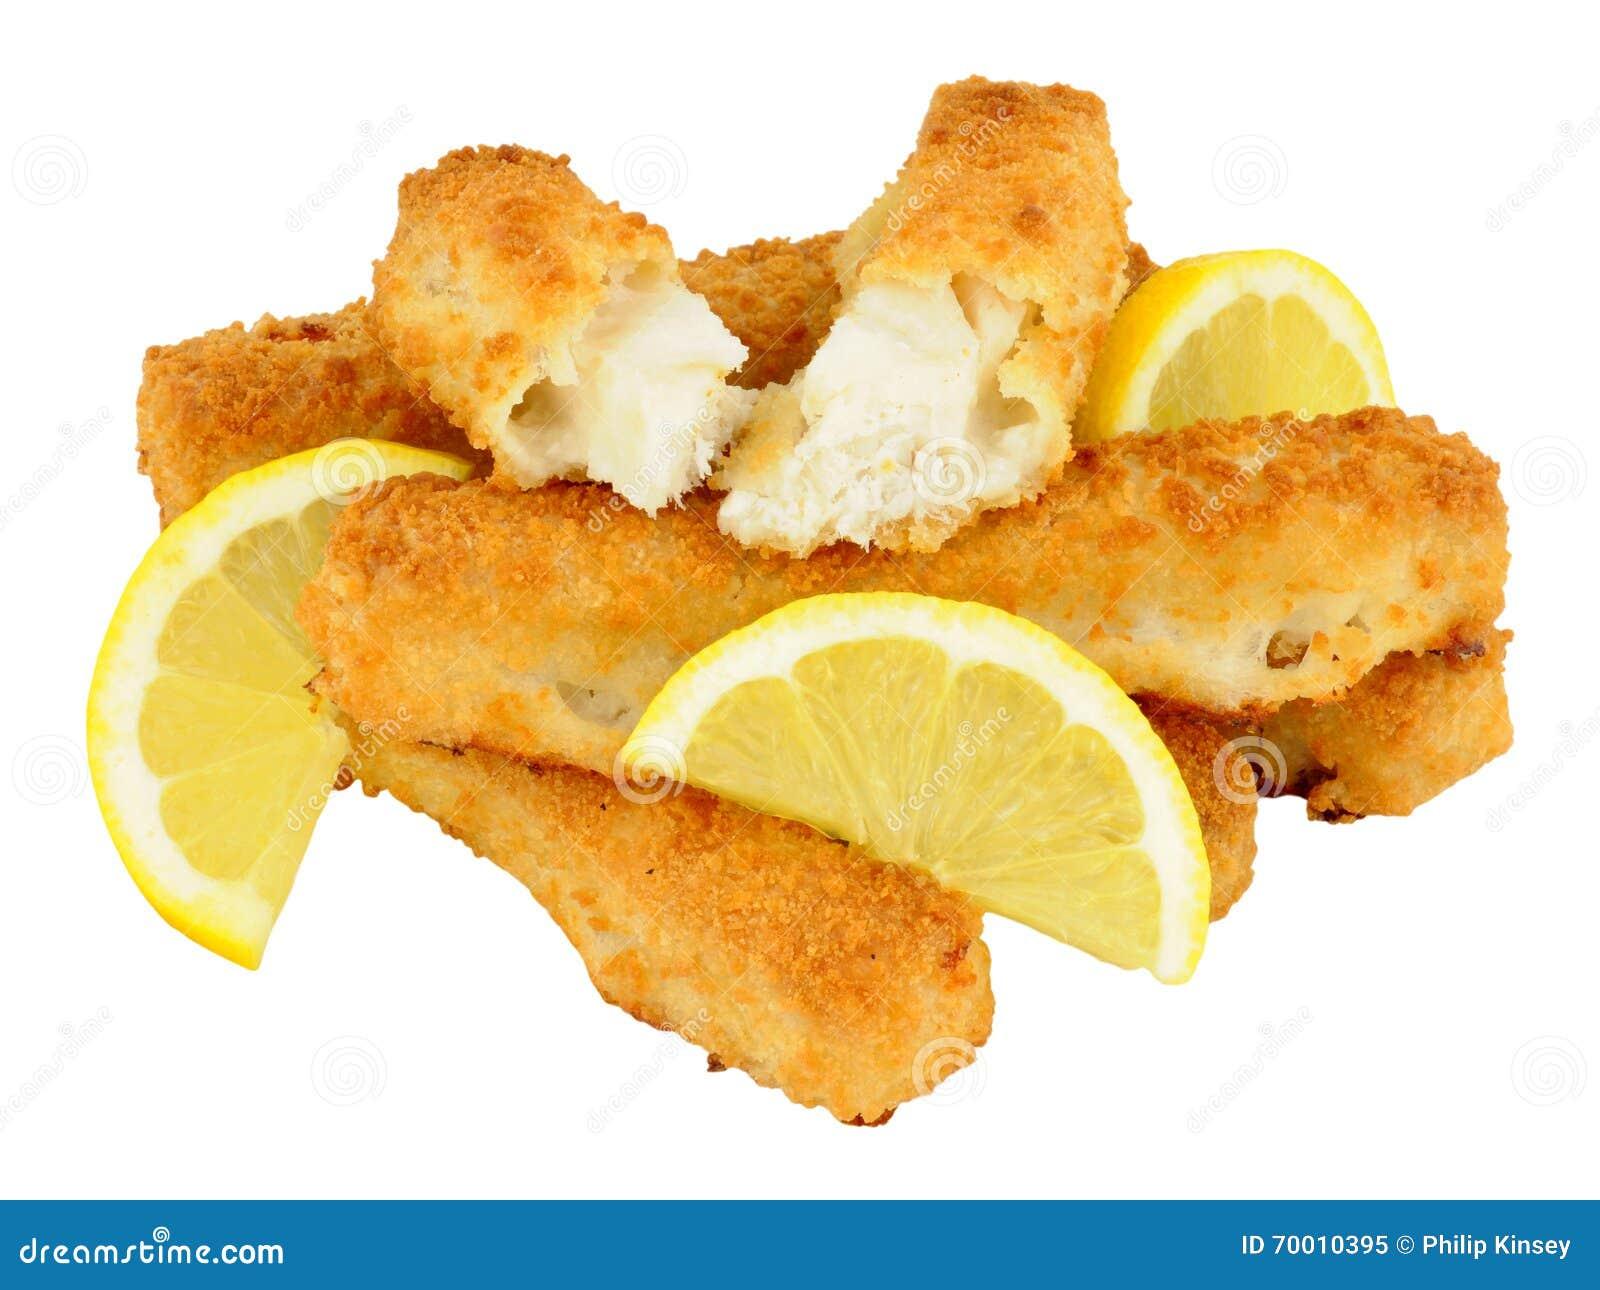 Chunky breadcrumb coated cod fish fingers stock photo for Too cool fishing